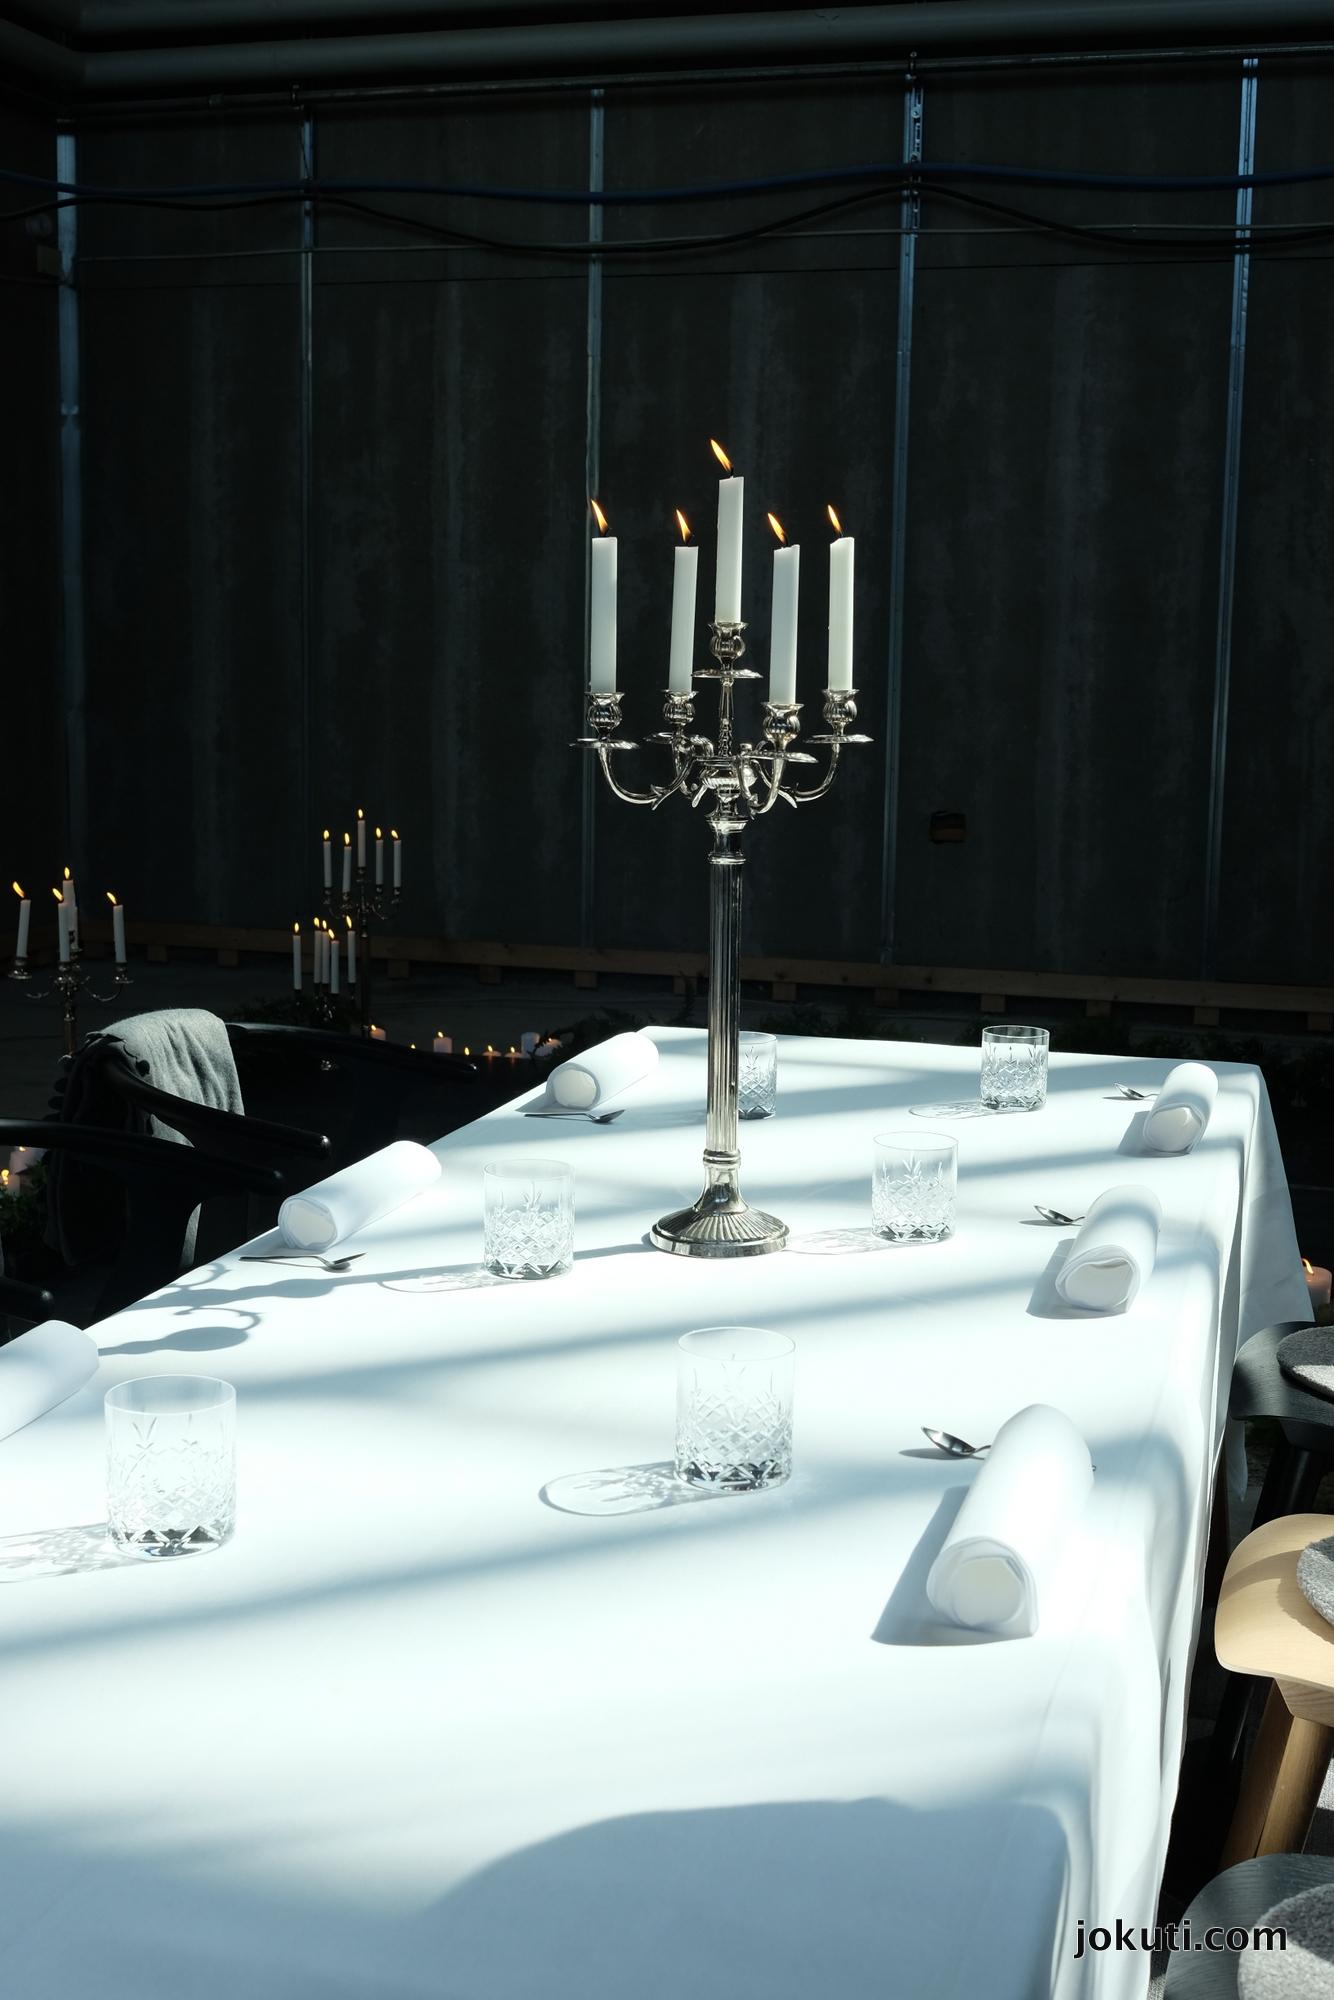 dscf5341_alchemist_popup_rasmus_munk_copenhagen_restaurant_vilagevo_jokuti.jpg